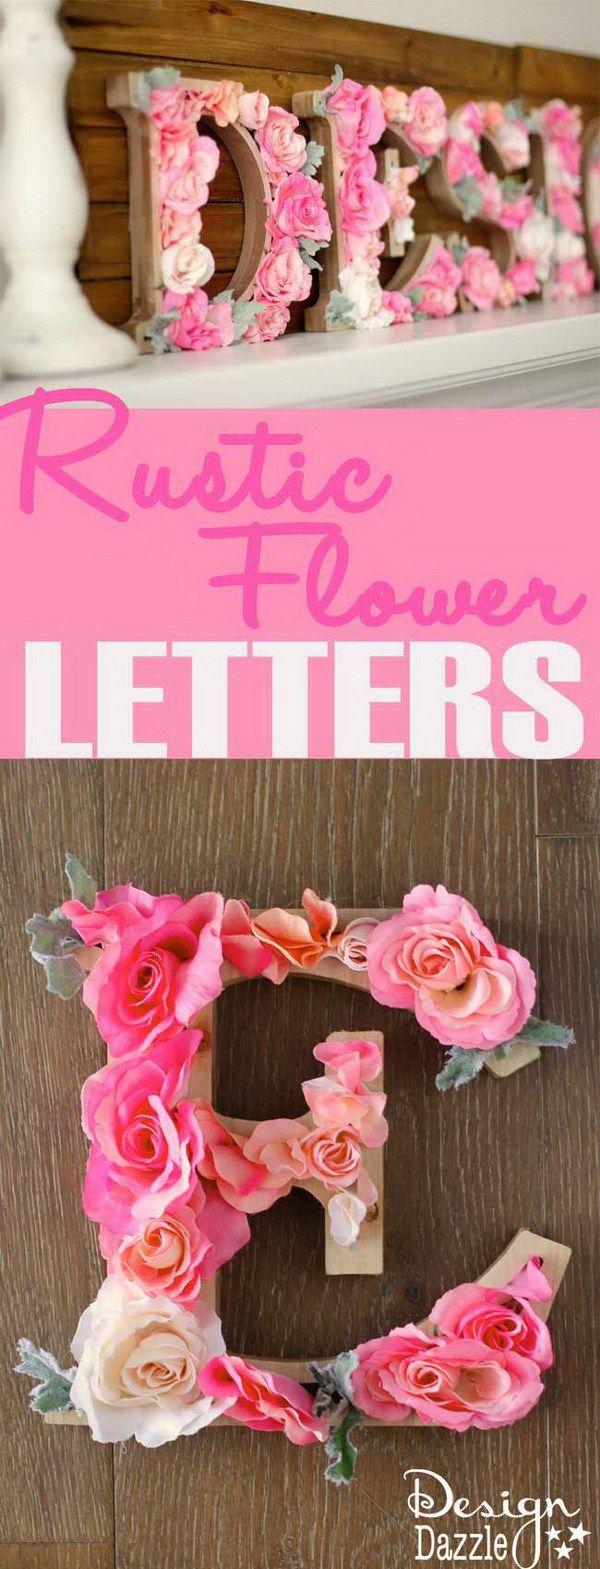 Best 25 flower letters ideas on pinterest letter for Shoulder decoration 9 letters